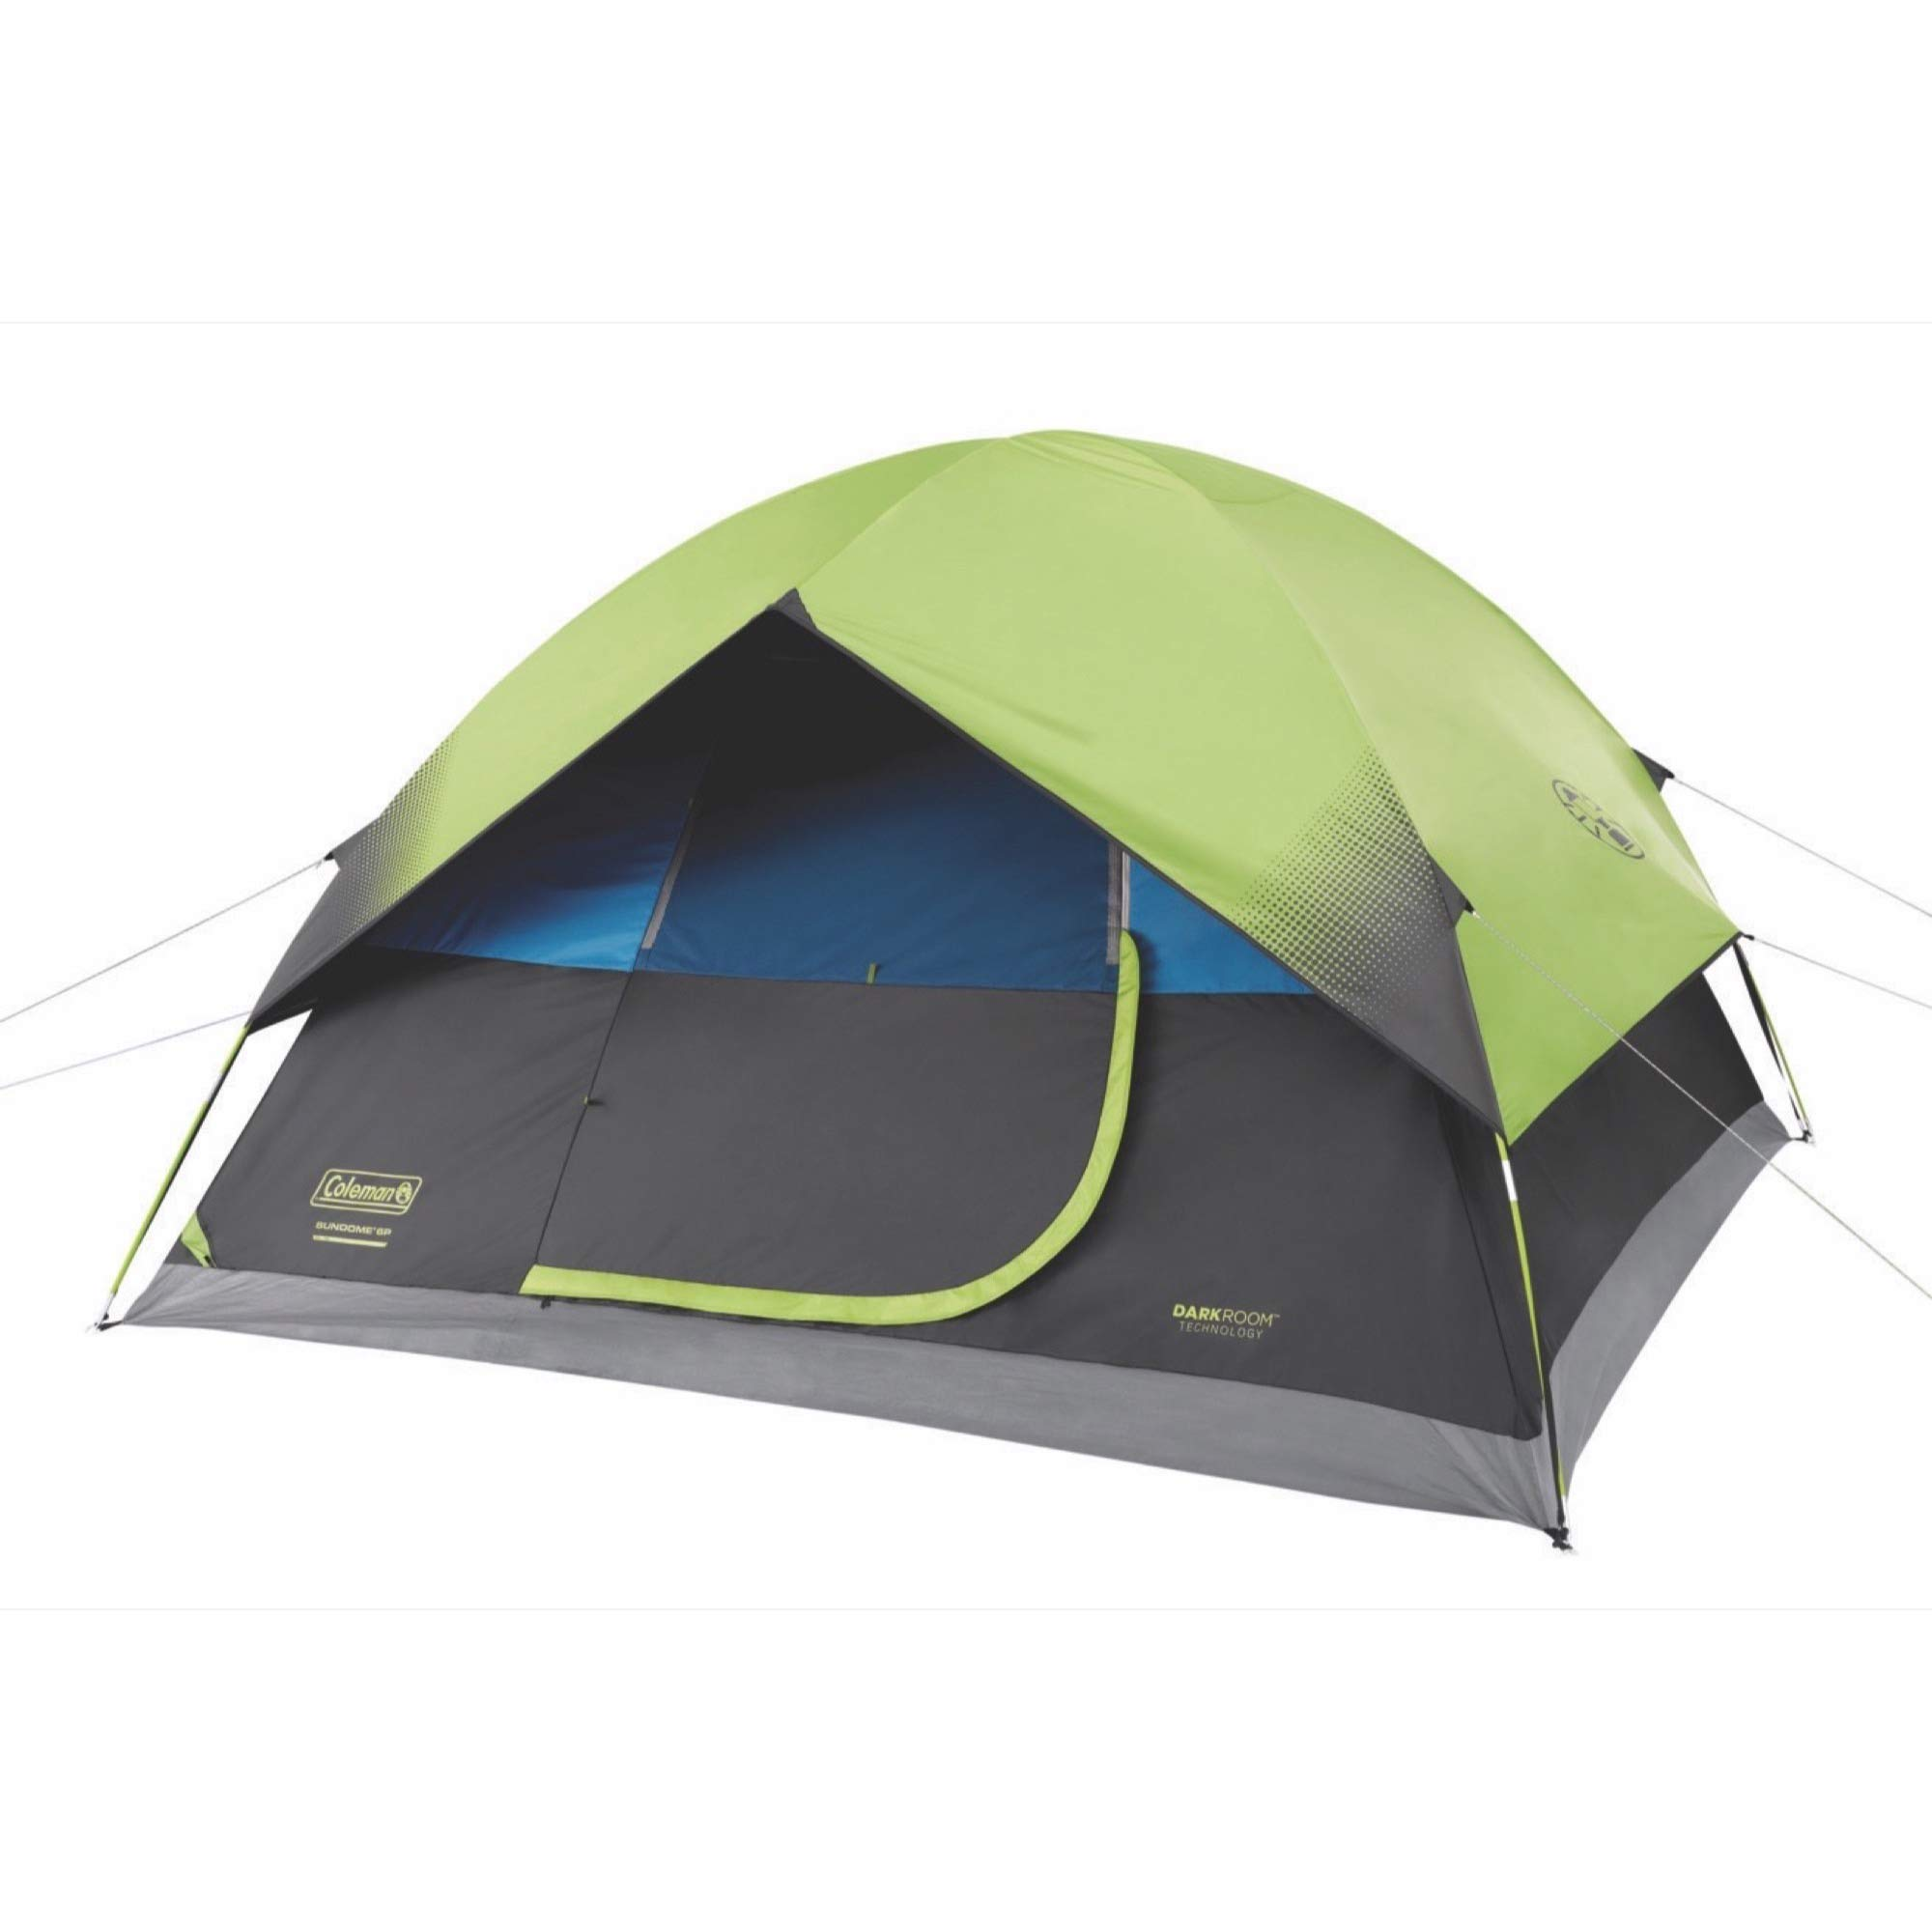 Coleman 6-Person Dark Room Sundome Tent, Green/Black/Teal